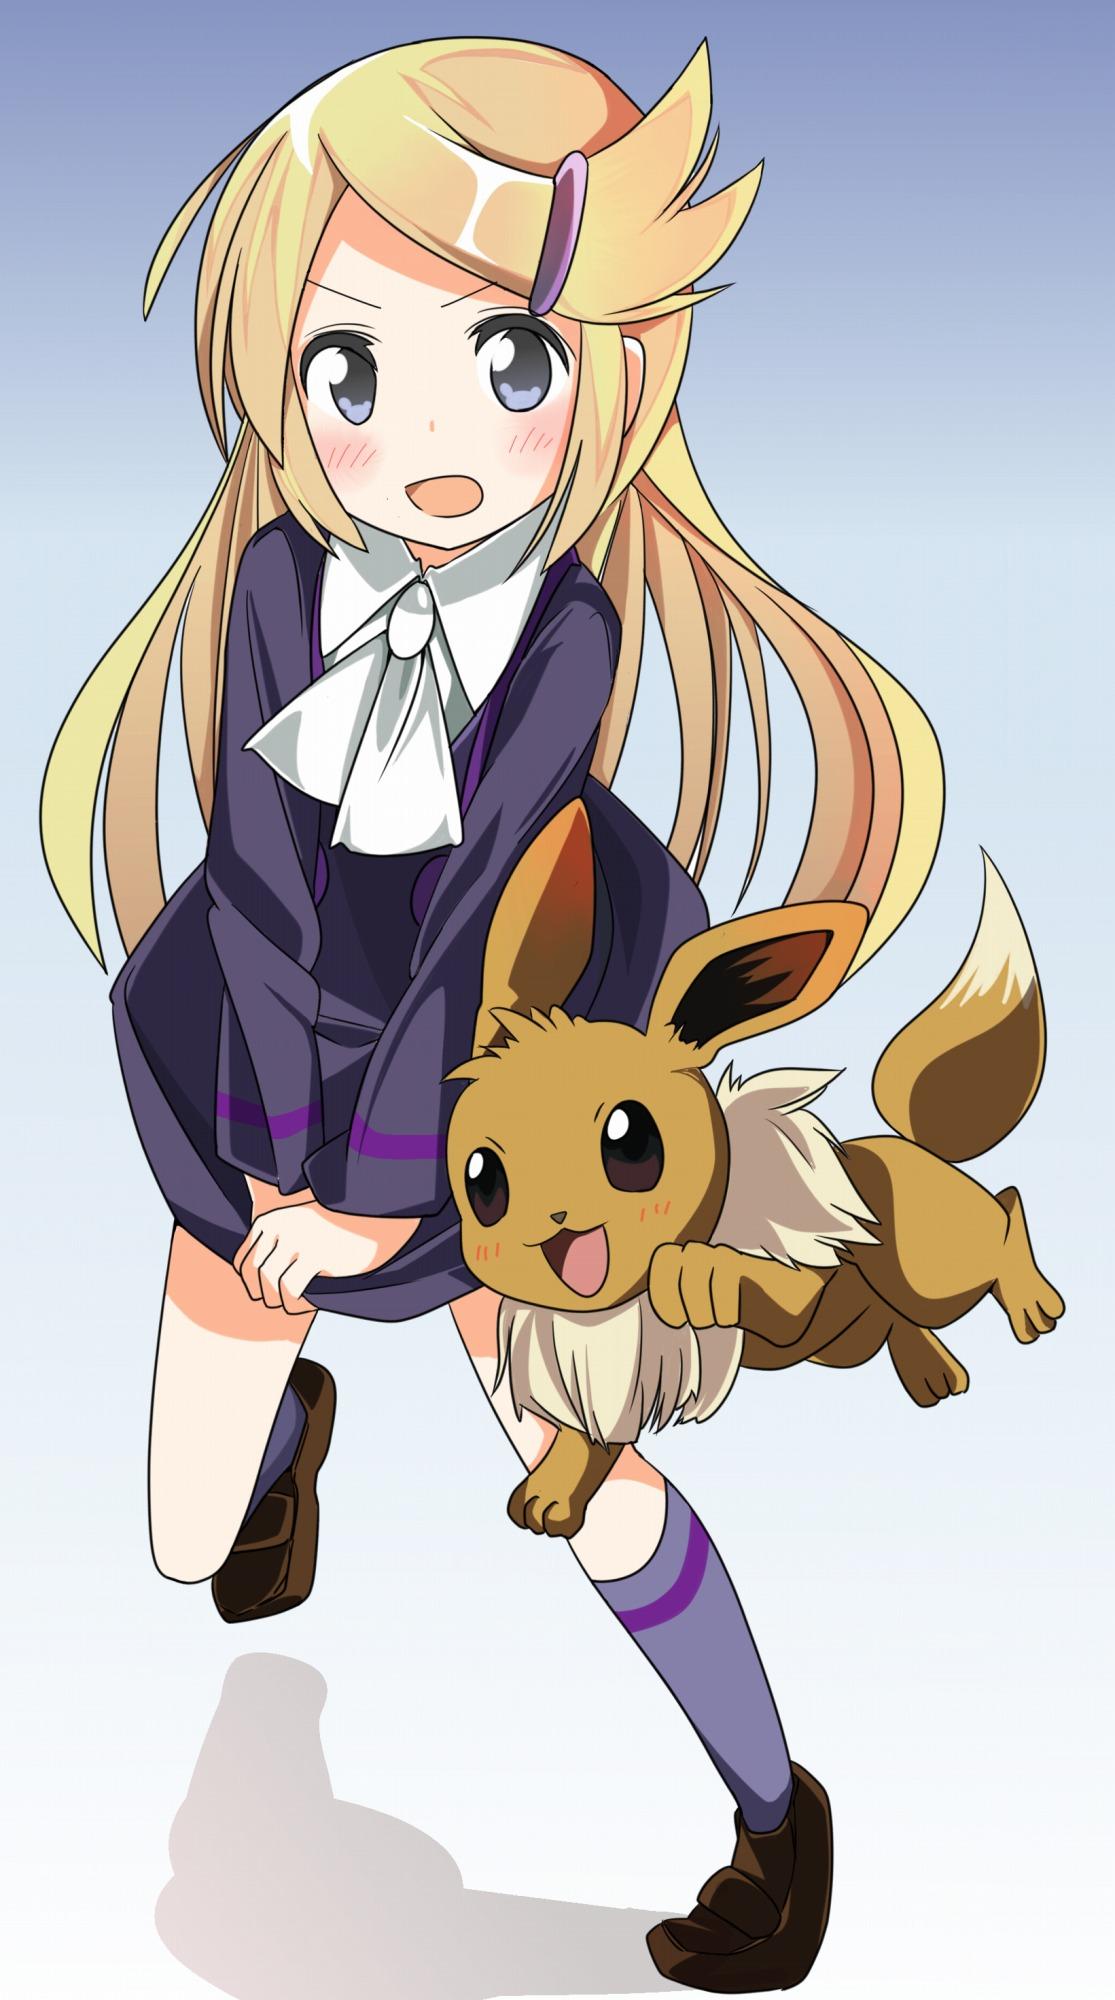 kanikama, ace trainer (pokemon), creatures (company), game